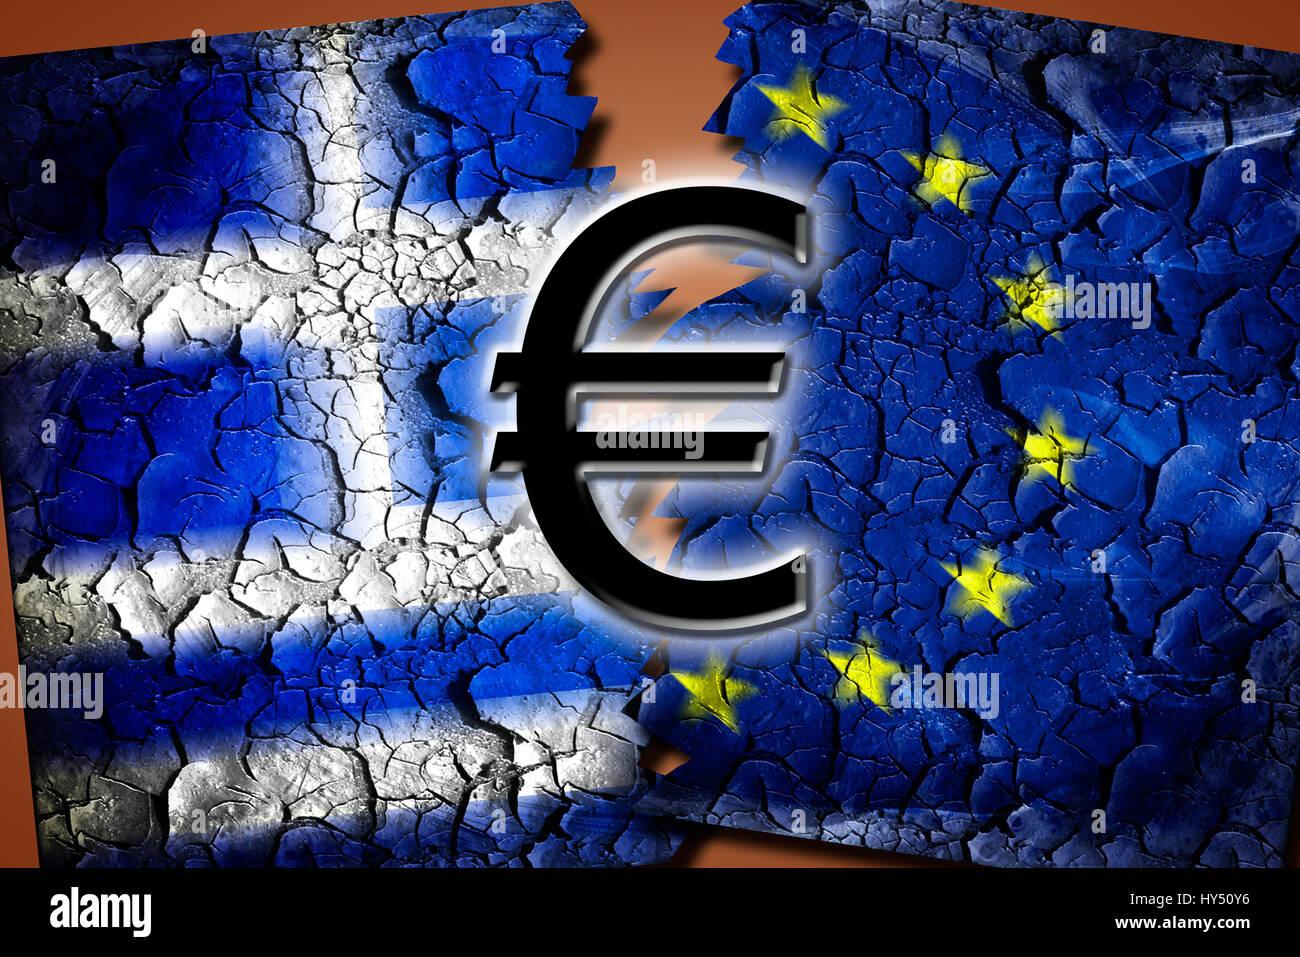 Greece and EU flag with tears and eurosigns, symbolic photo Grexit, Griechenland- und EU-Fahne mit Rissen und Eurozeichen, Stock Photo